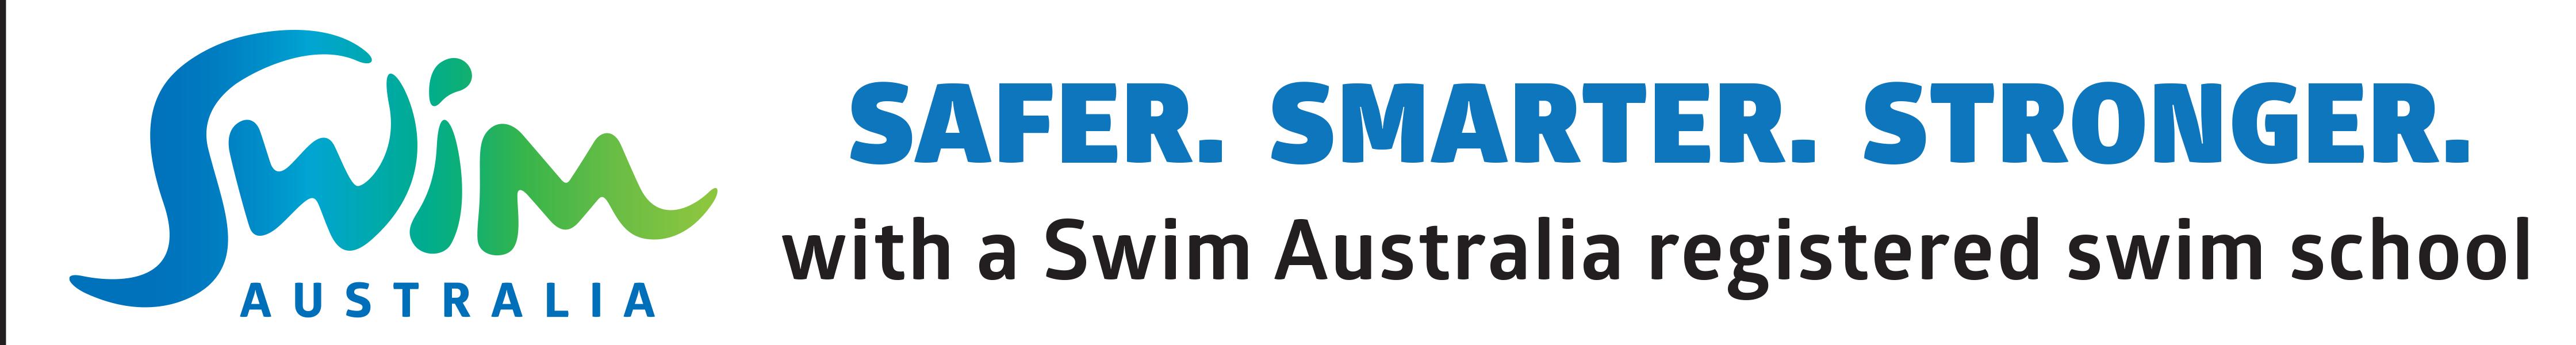 Swim Australia